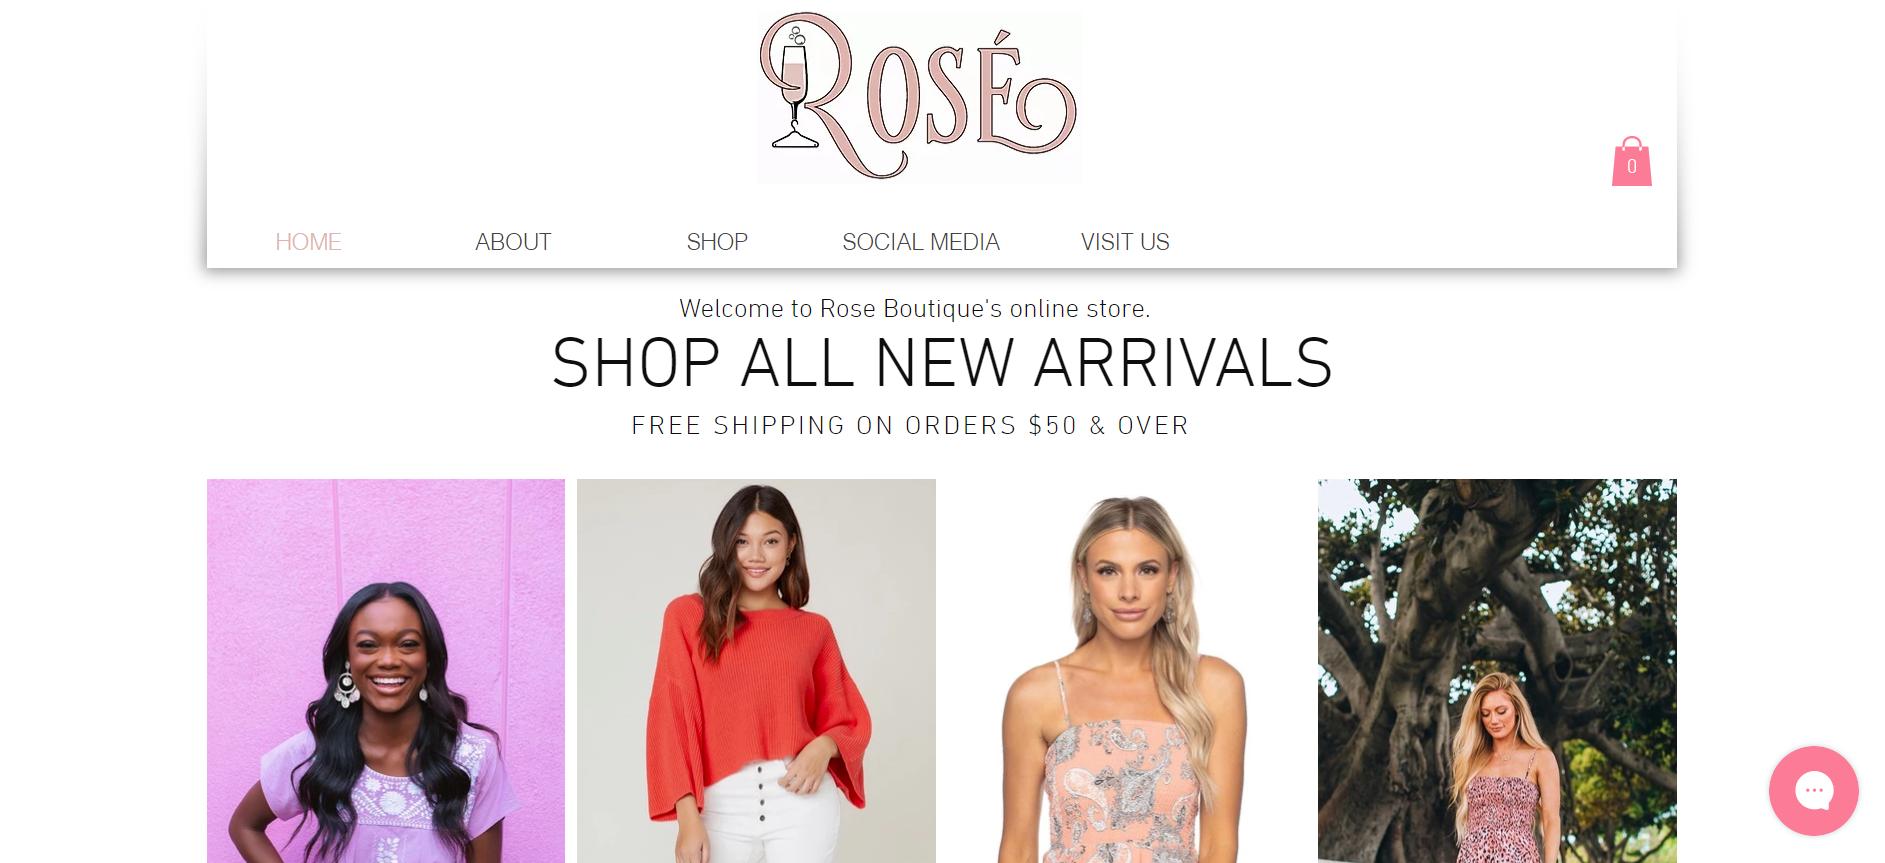 Rose Boutique Website